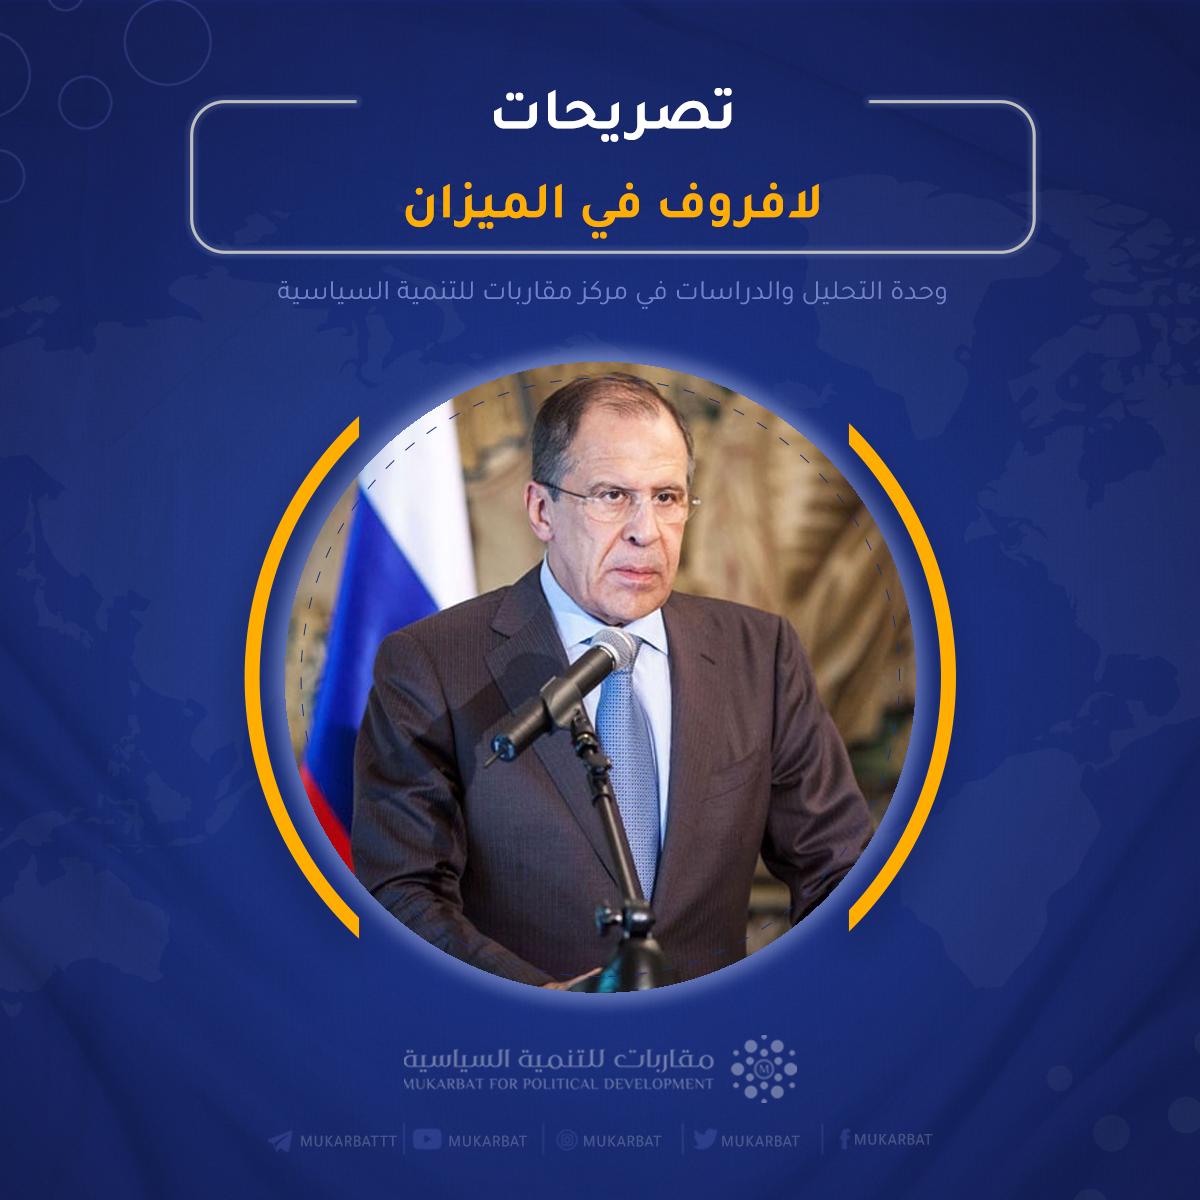 You are currently viewing تصريحات سيرغي لافروف وزير الخارجية الروسي